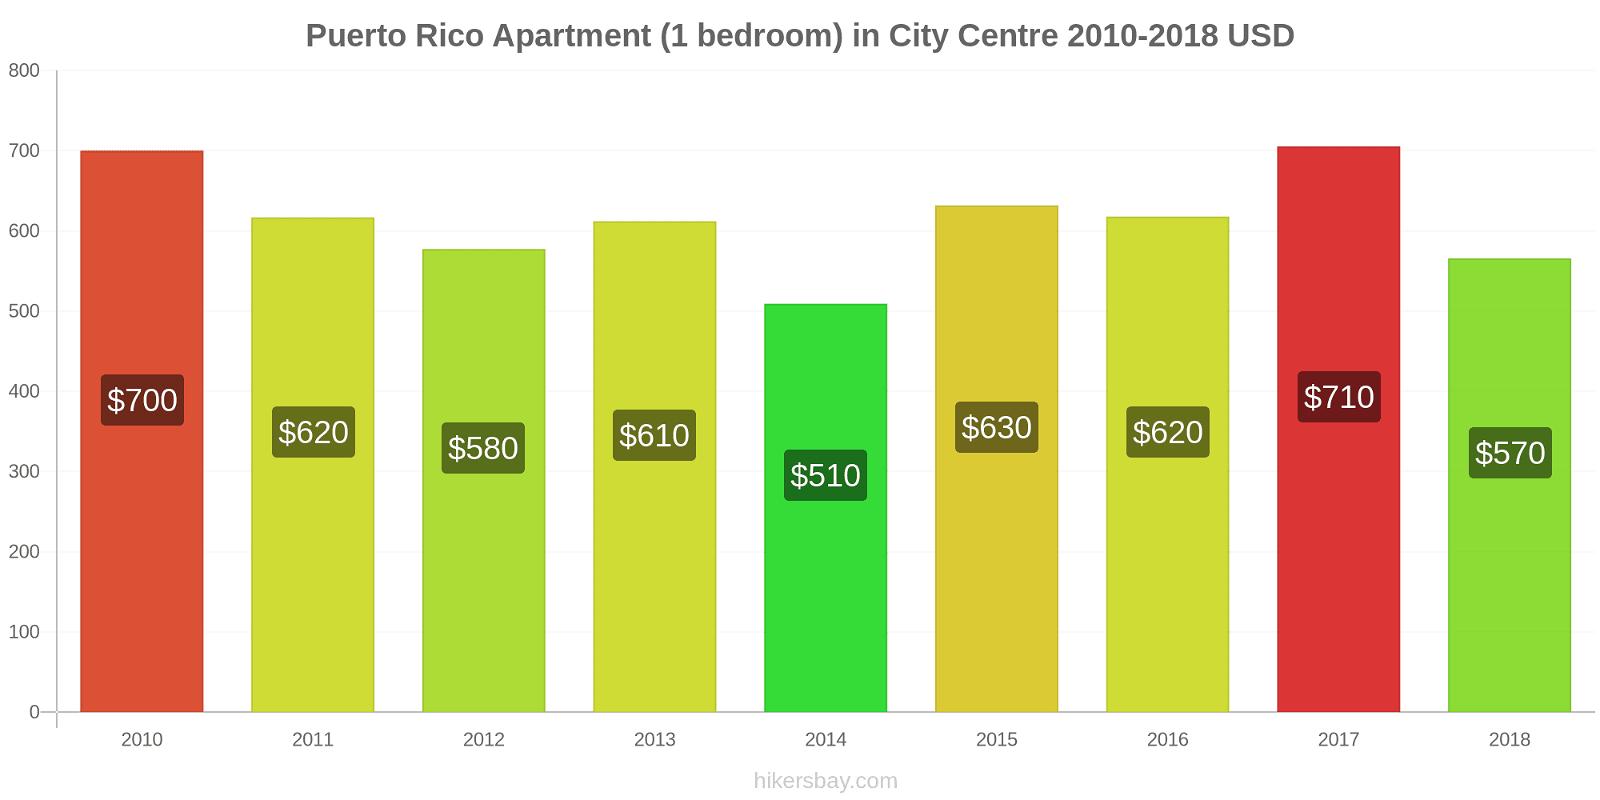 Puerto Rico price changes Apartment (1 bedroom) in City Centre hikersbay.com